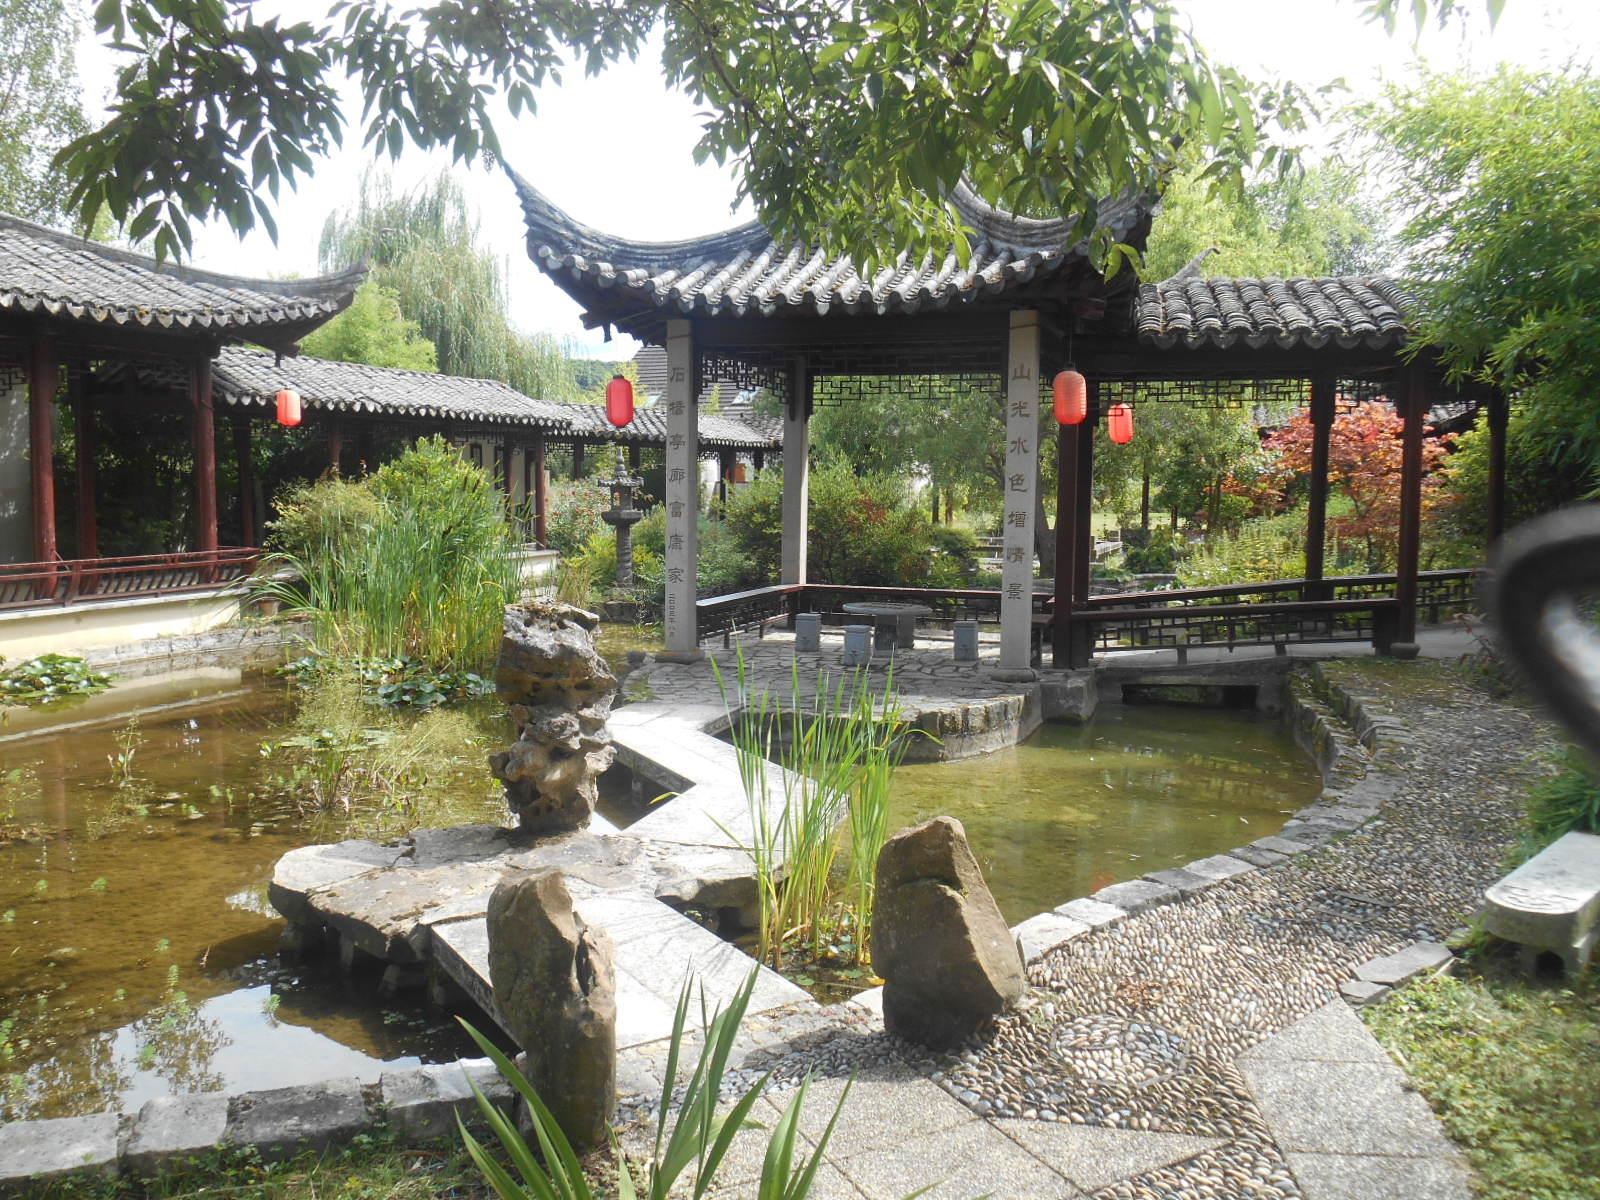 File Kiosque1 Jardin Yili Jpg Wikimedia Commons